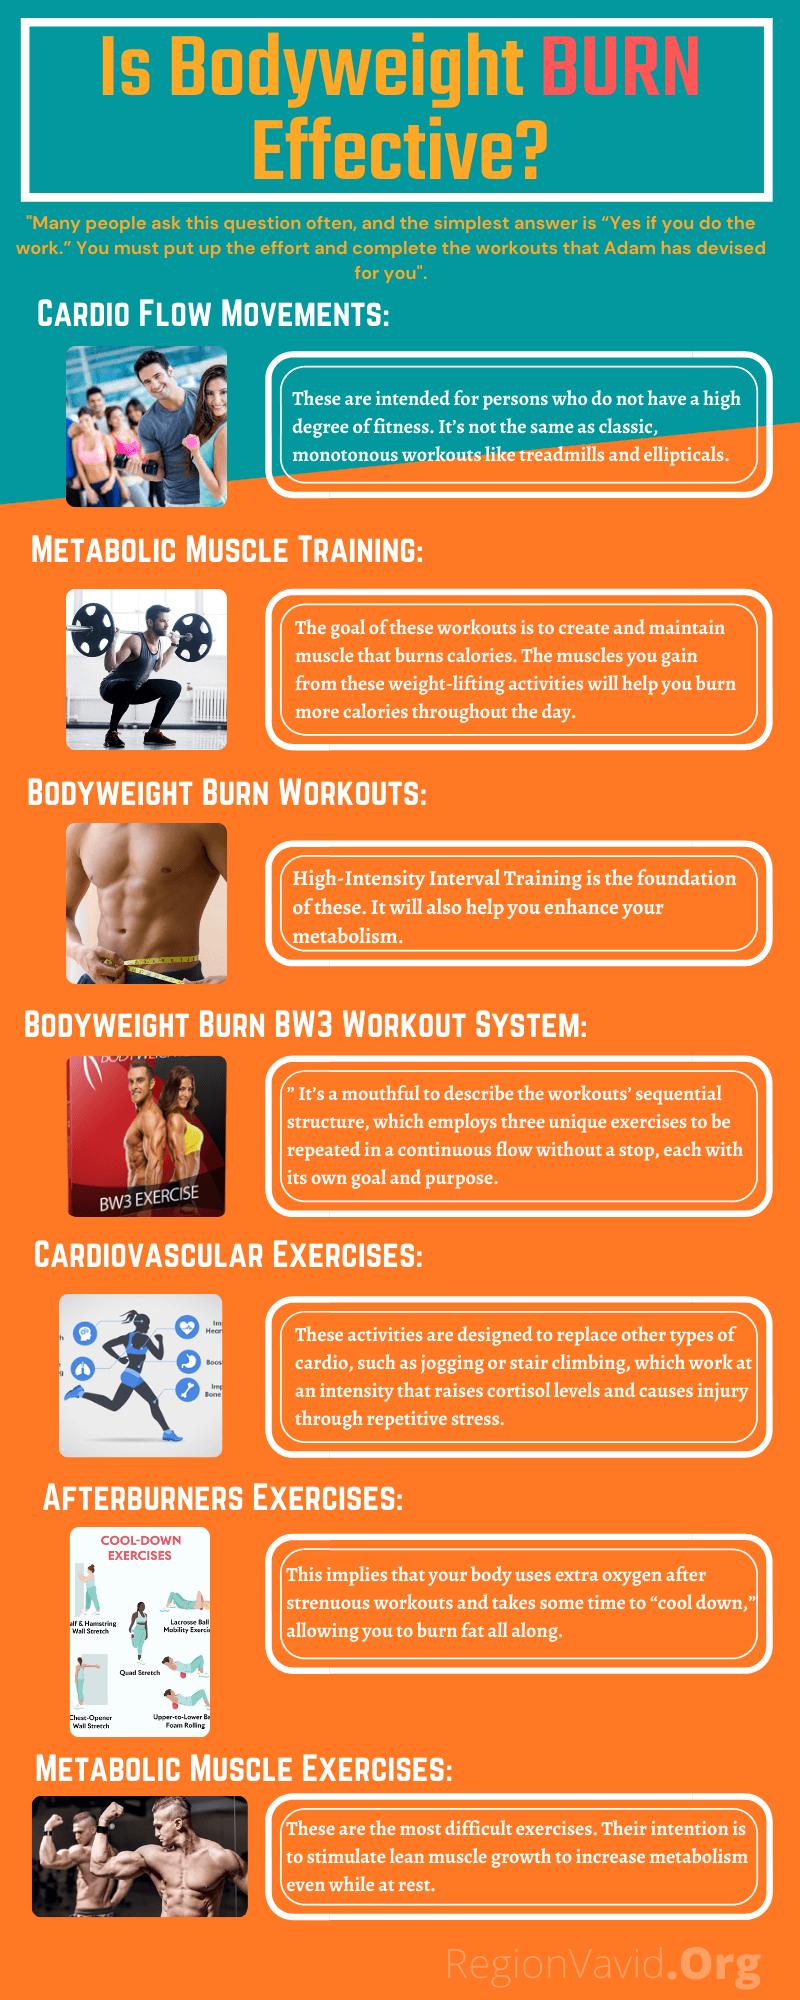 Bodyweight Burn Effectivity